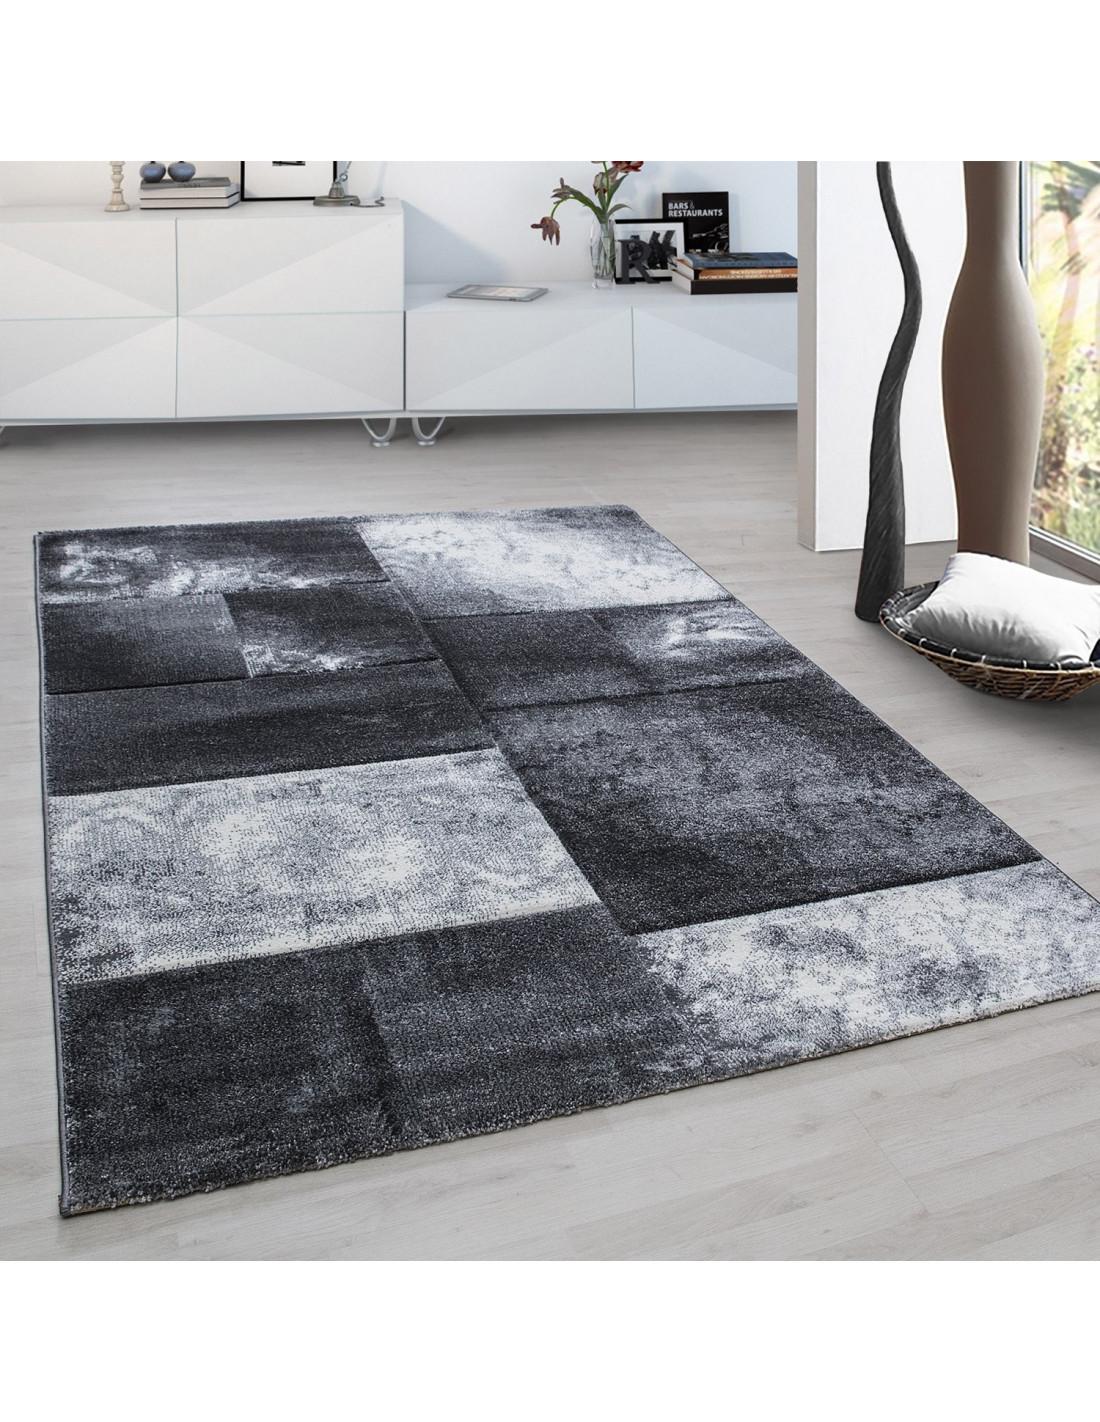 Modern designer contour cut 3D living room rug Hawaii 1710 gray